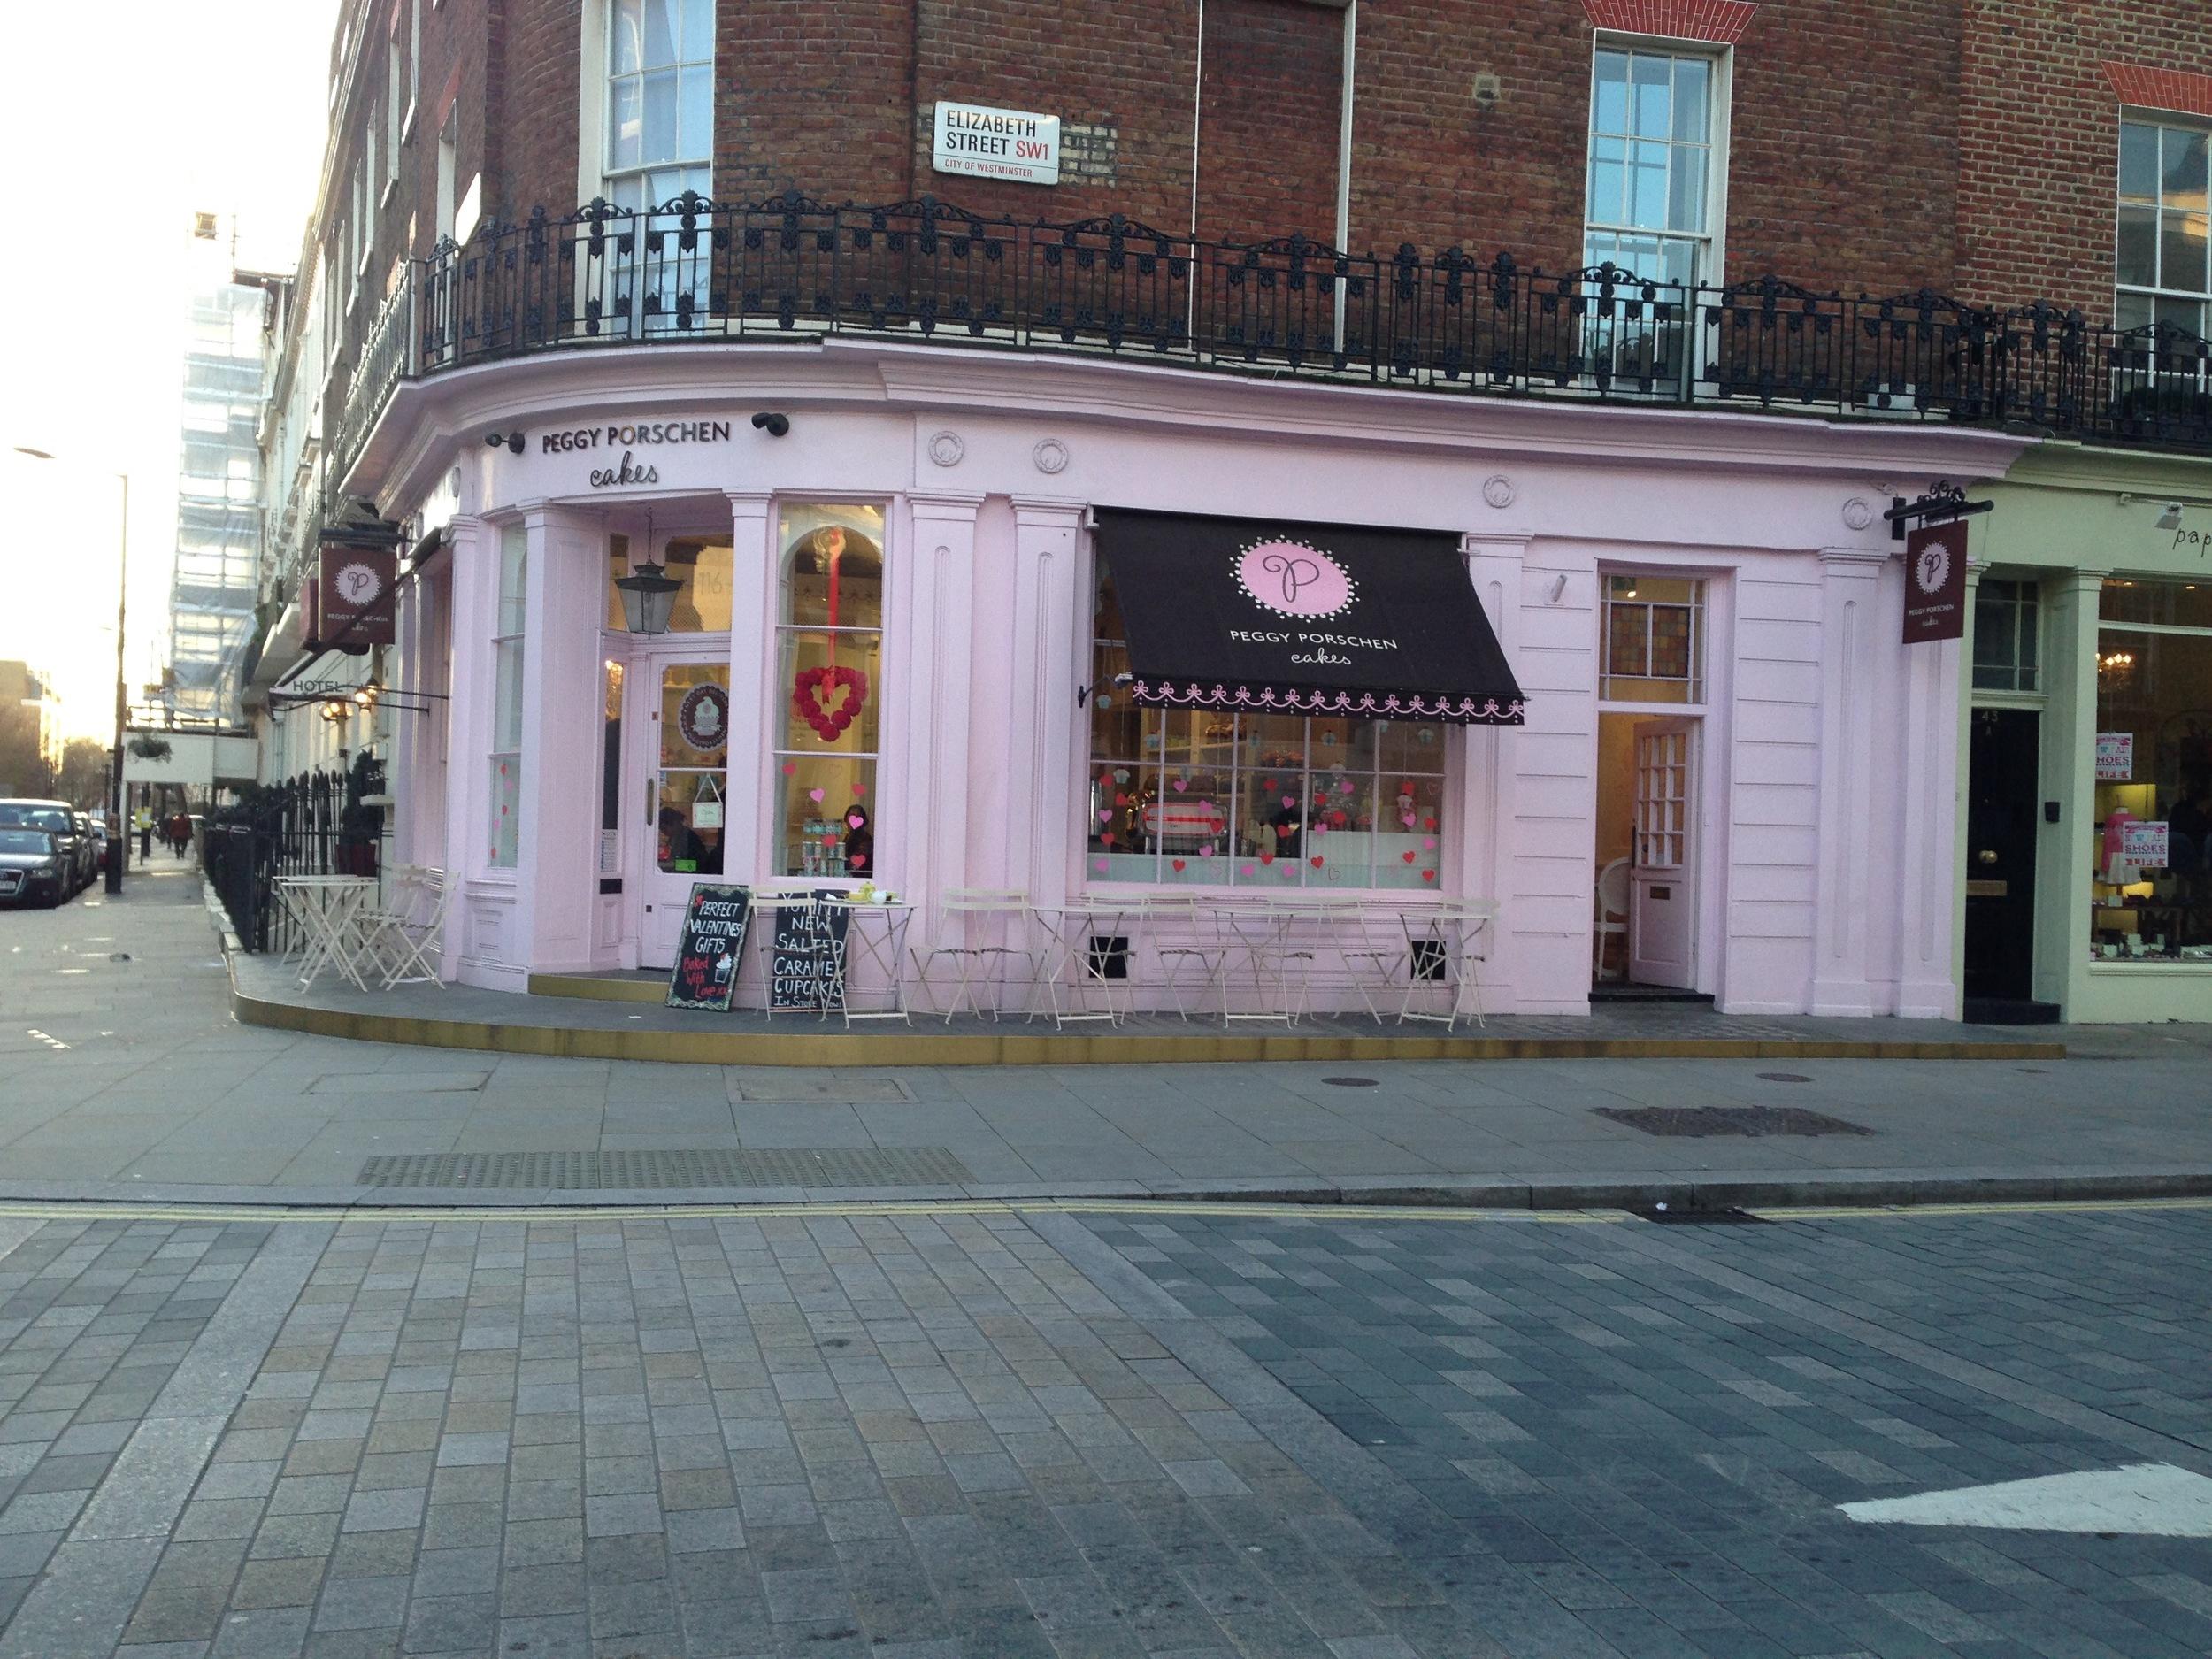 Peggy Porschen's Parlour - 116 Edbury St Belgravia, London.